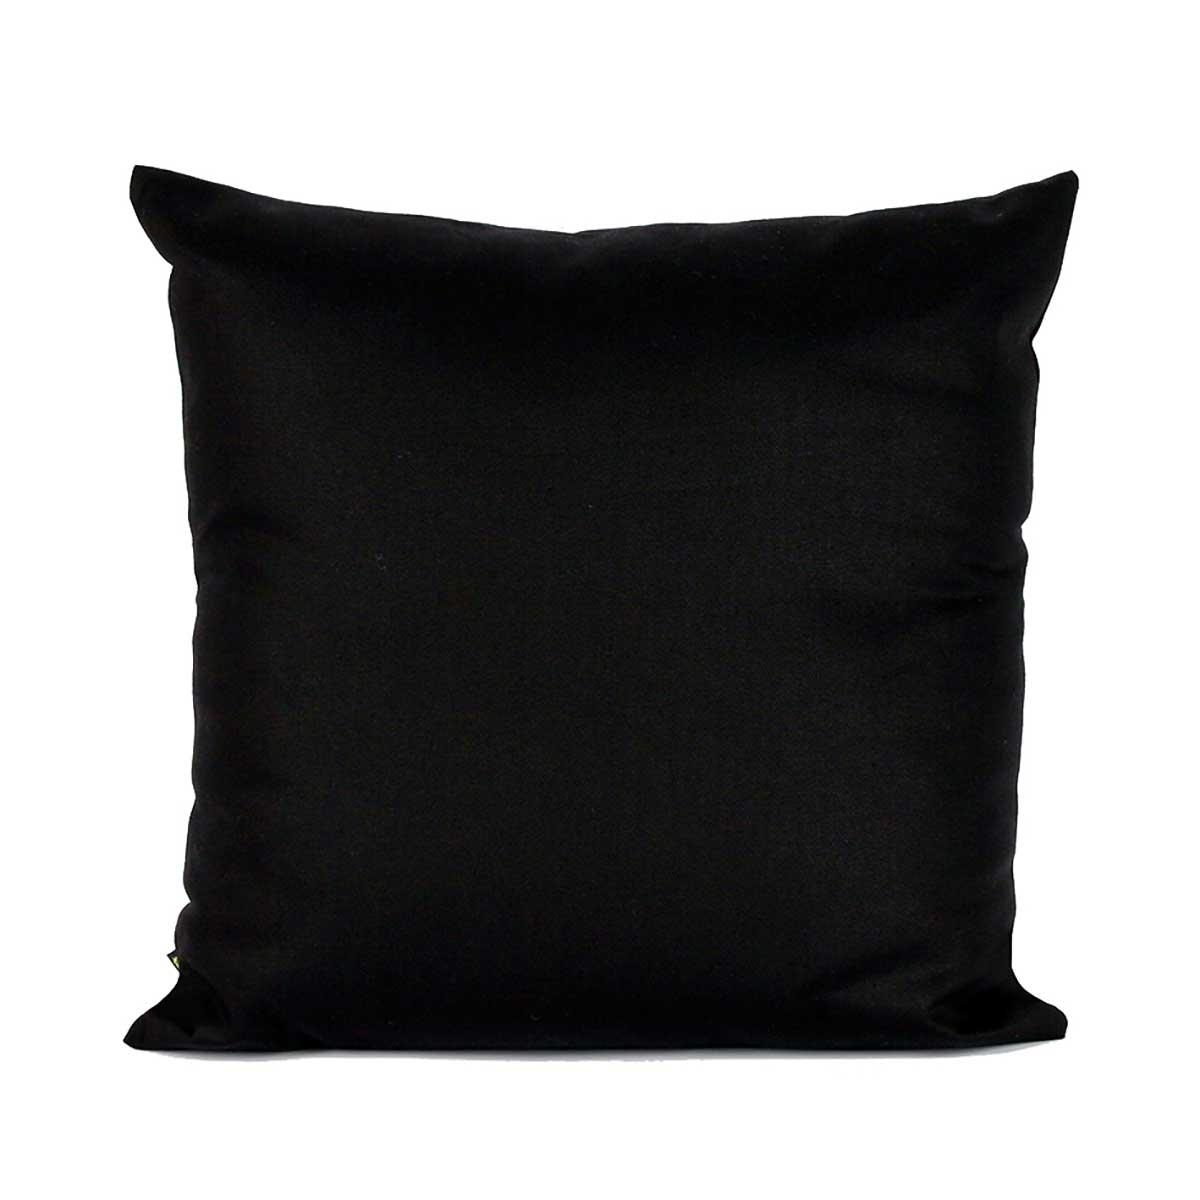 Almofada Lisa Preta 45 x 45 cm